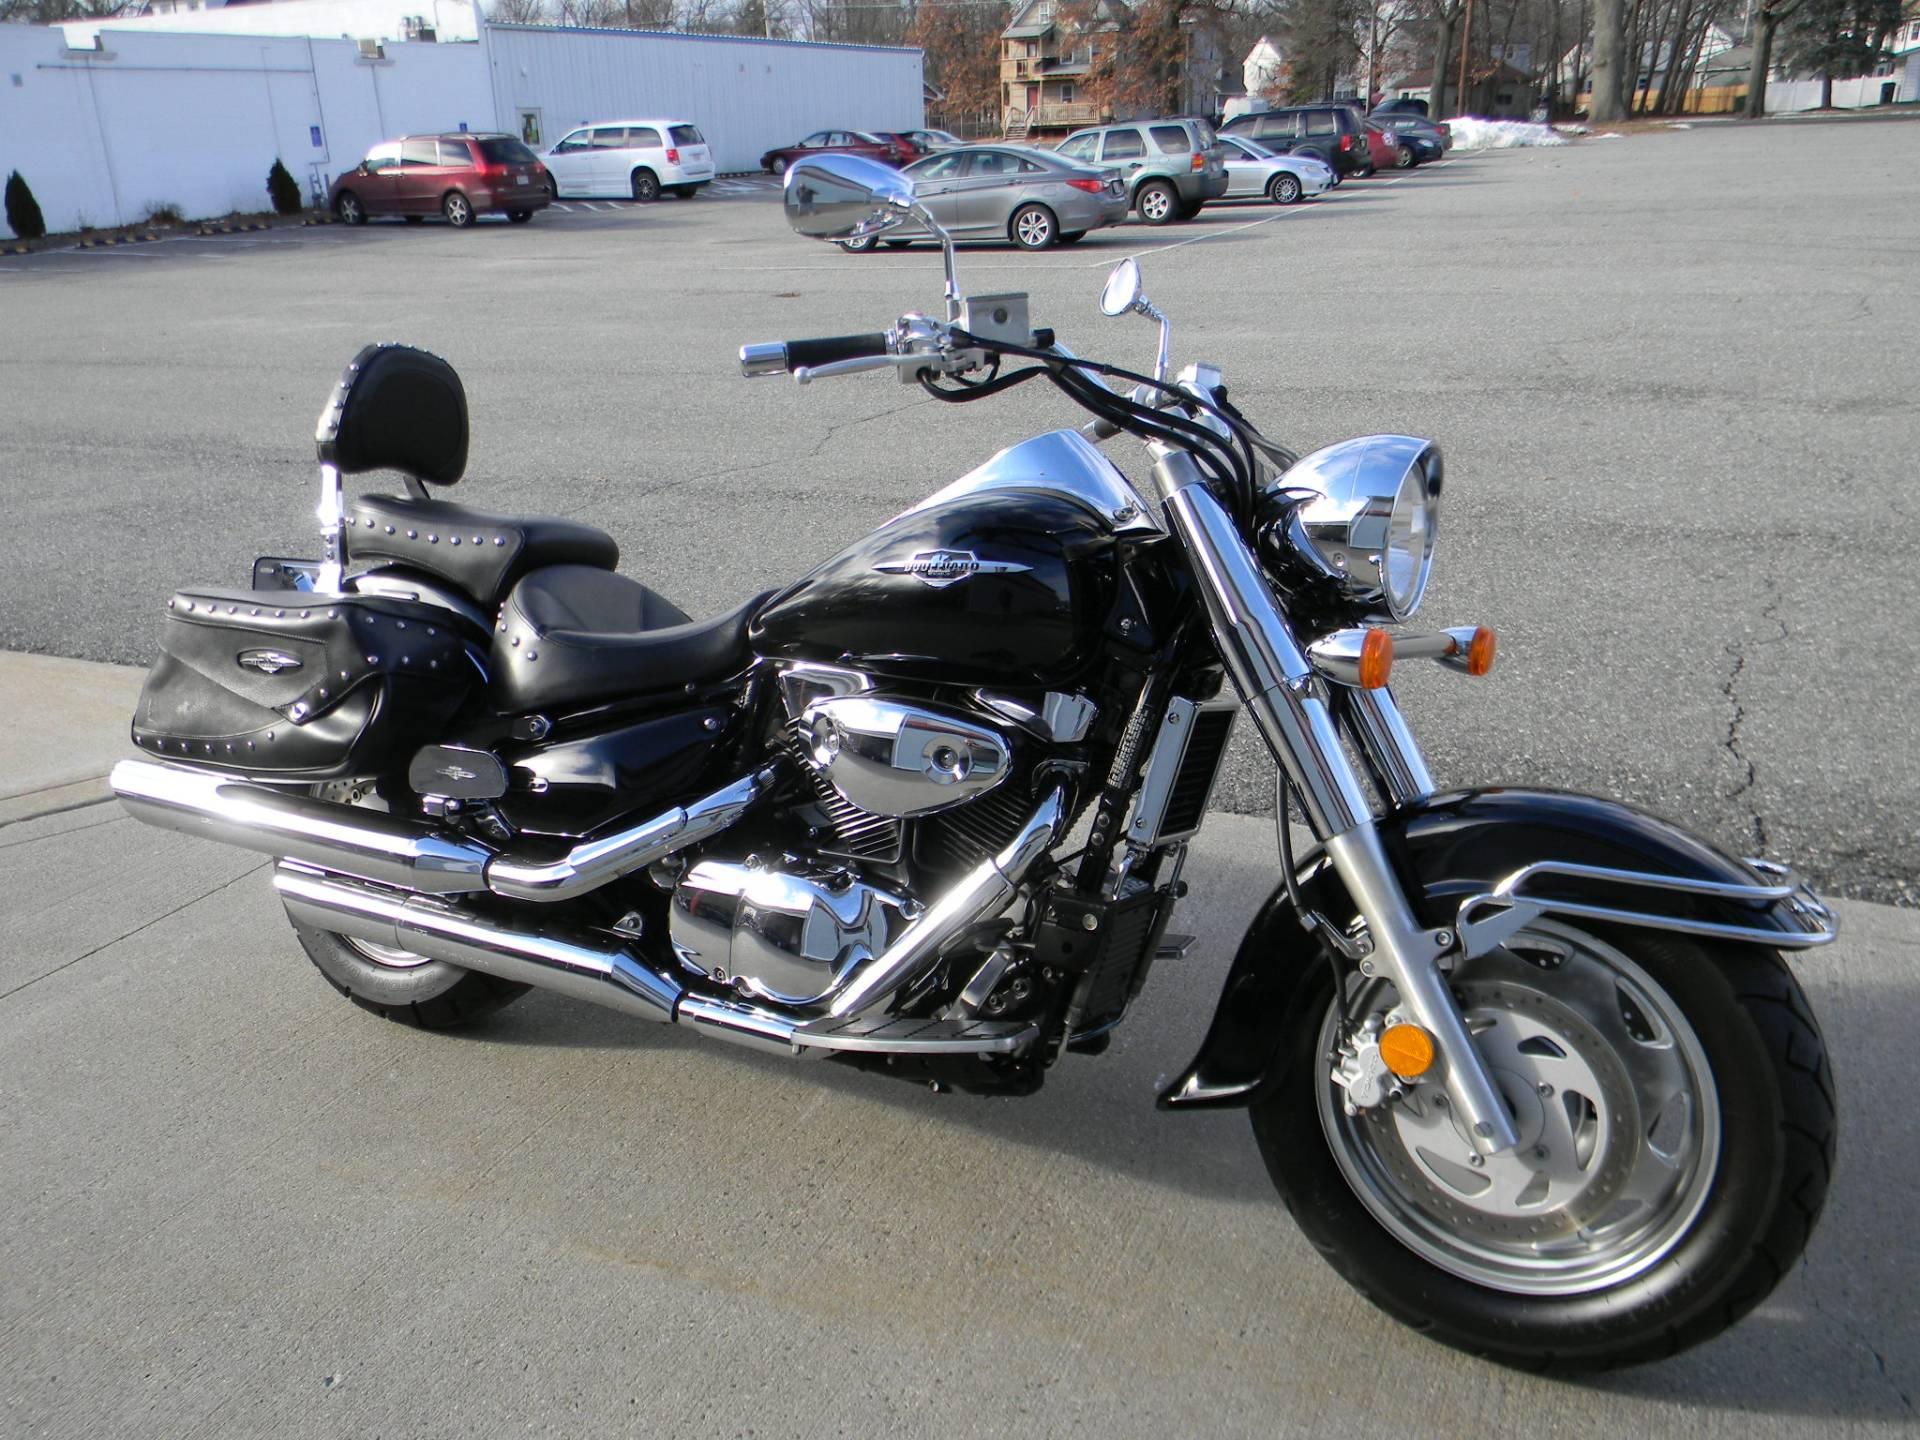 2005 Suzuki Boulevard C90T in Springfield, Massachusetts